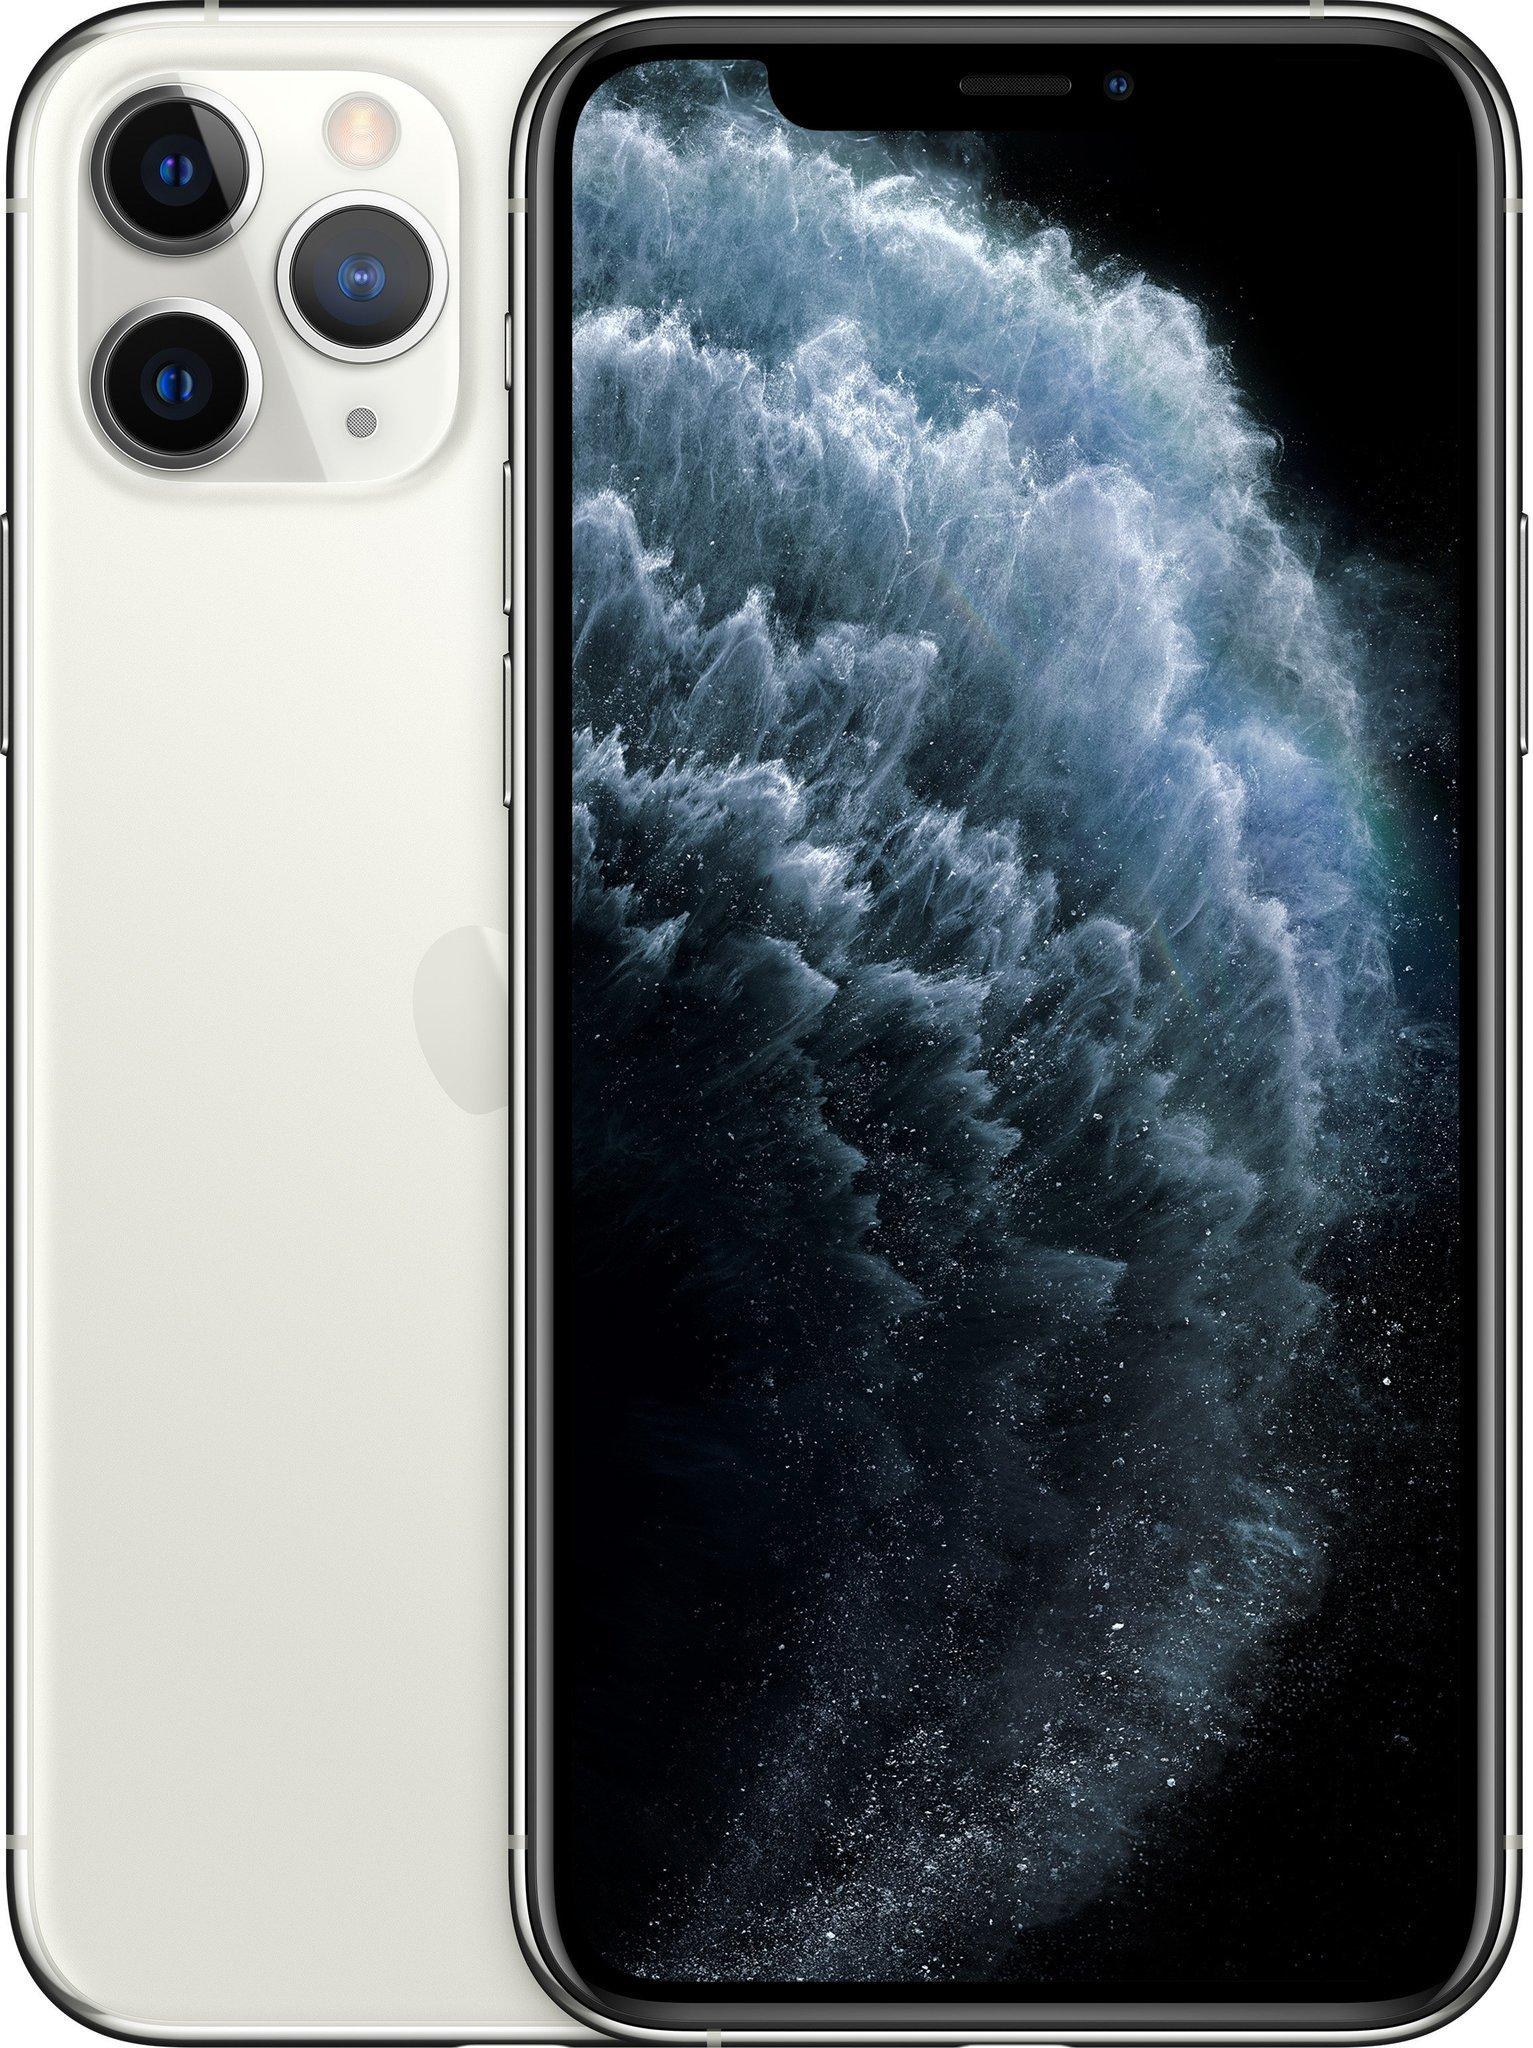 iPhone 11 Pro Max Apple iPhone 11 Pro Max 256gb Серебристый white1.jpg